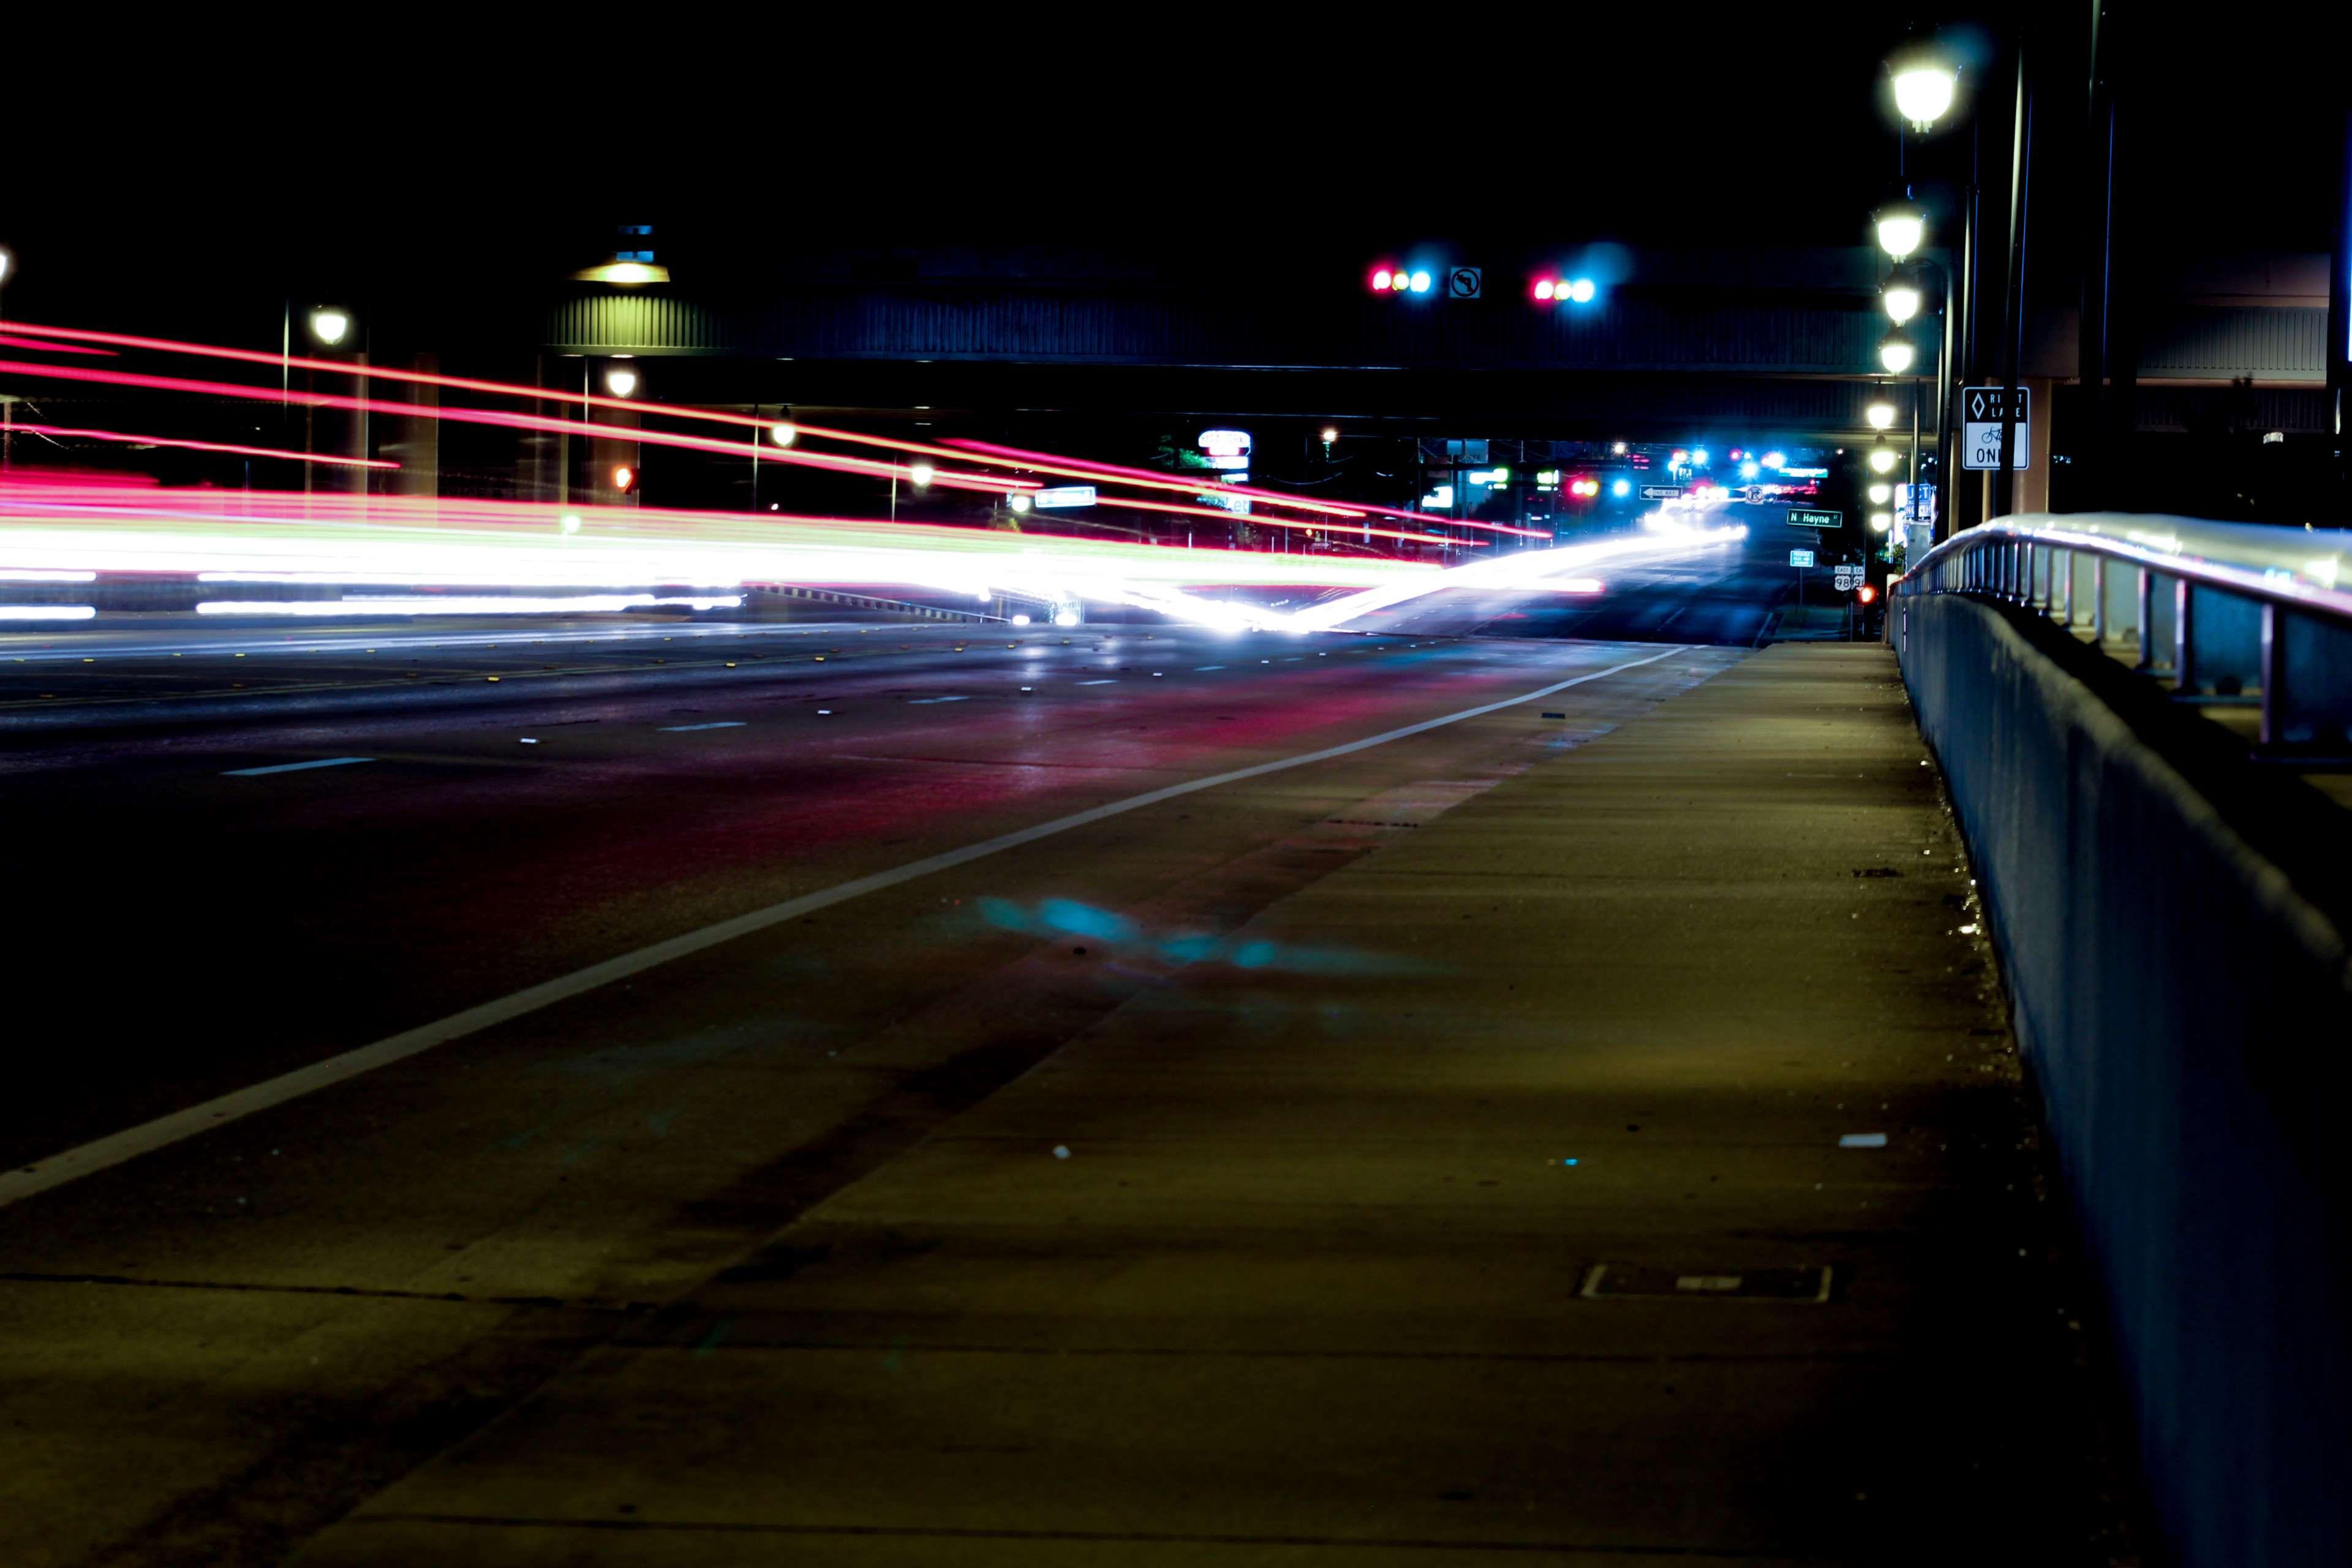 Background Image Car Lights City Lights Neon Night Lights